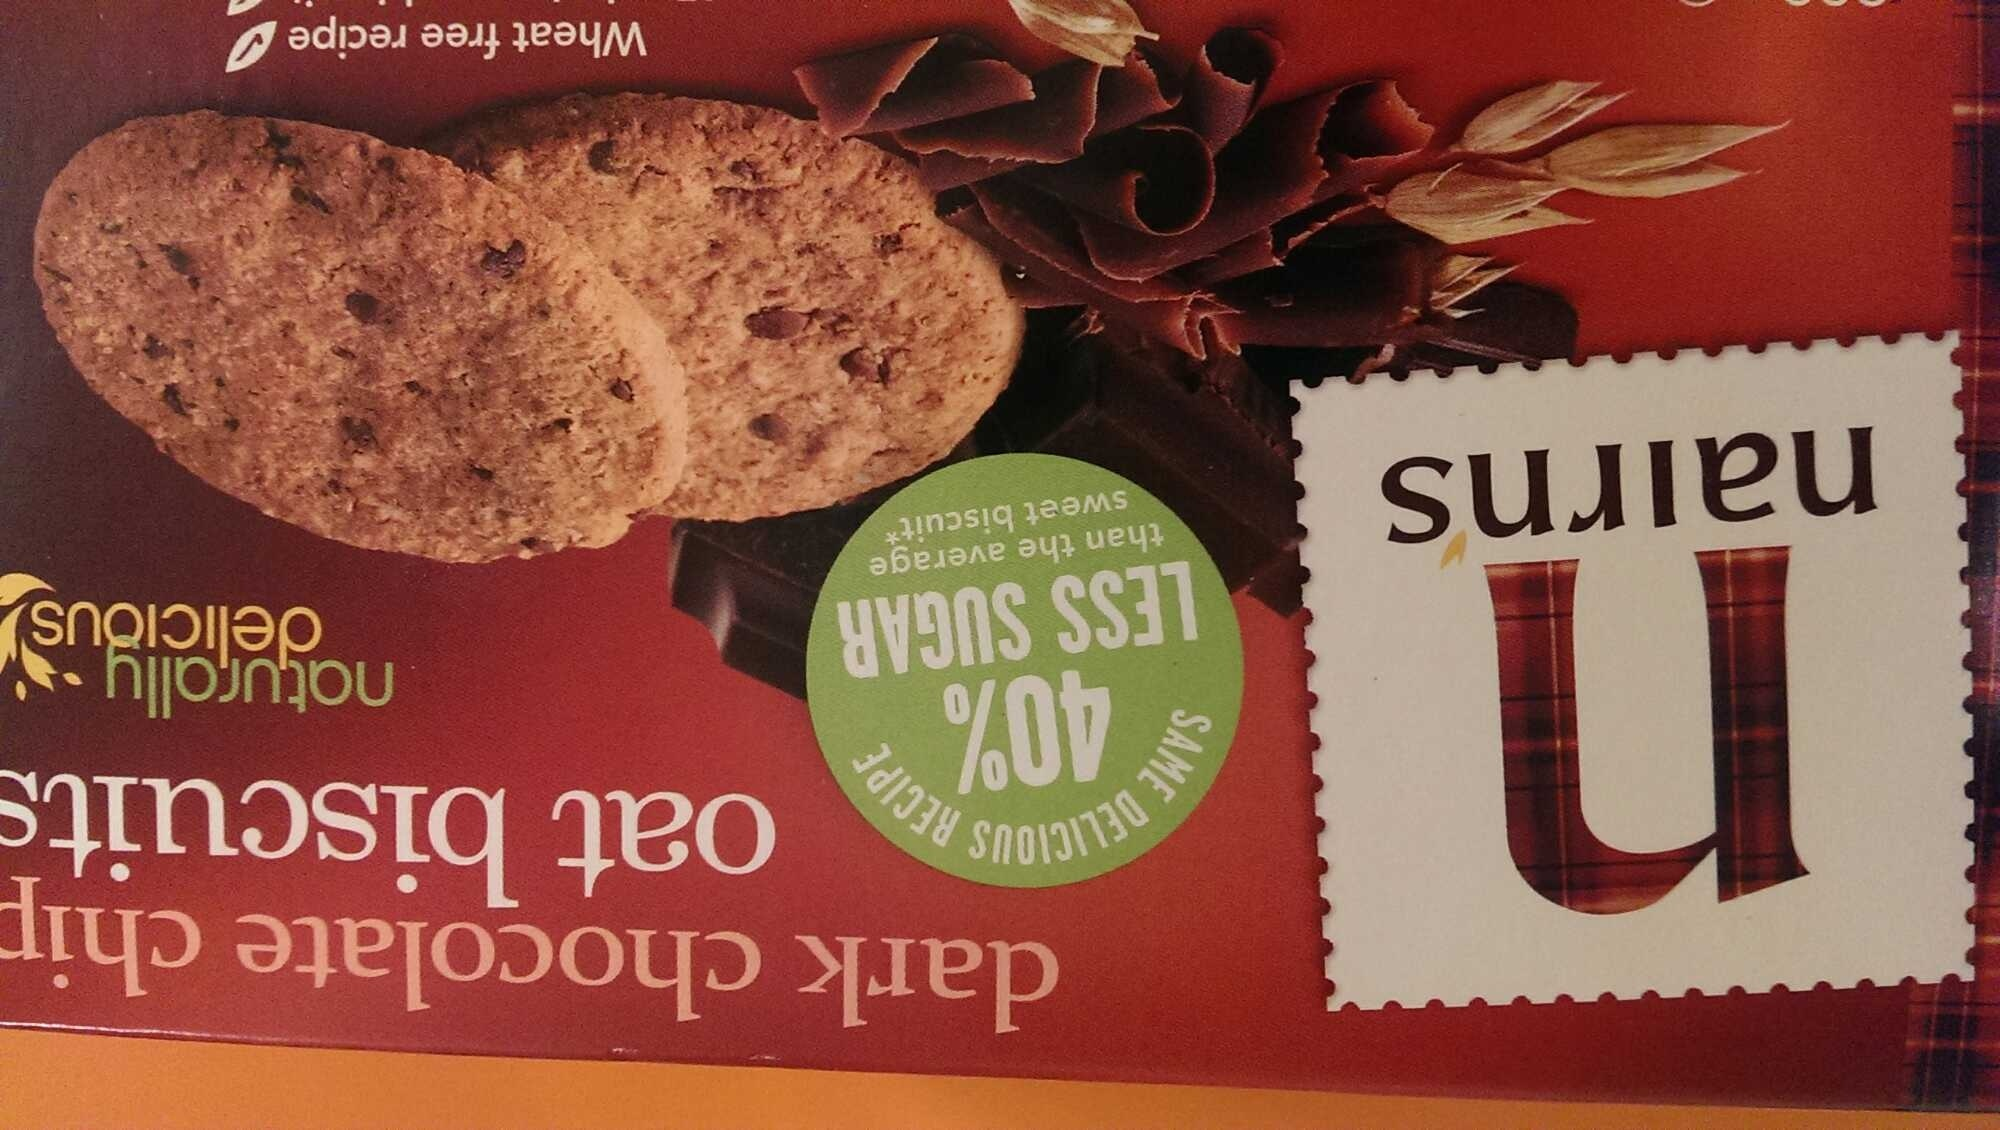 Dark chocolate chip oat biscuits - Product - en